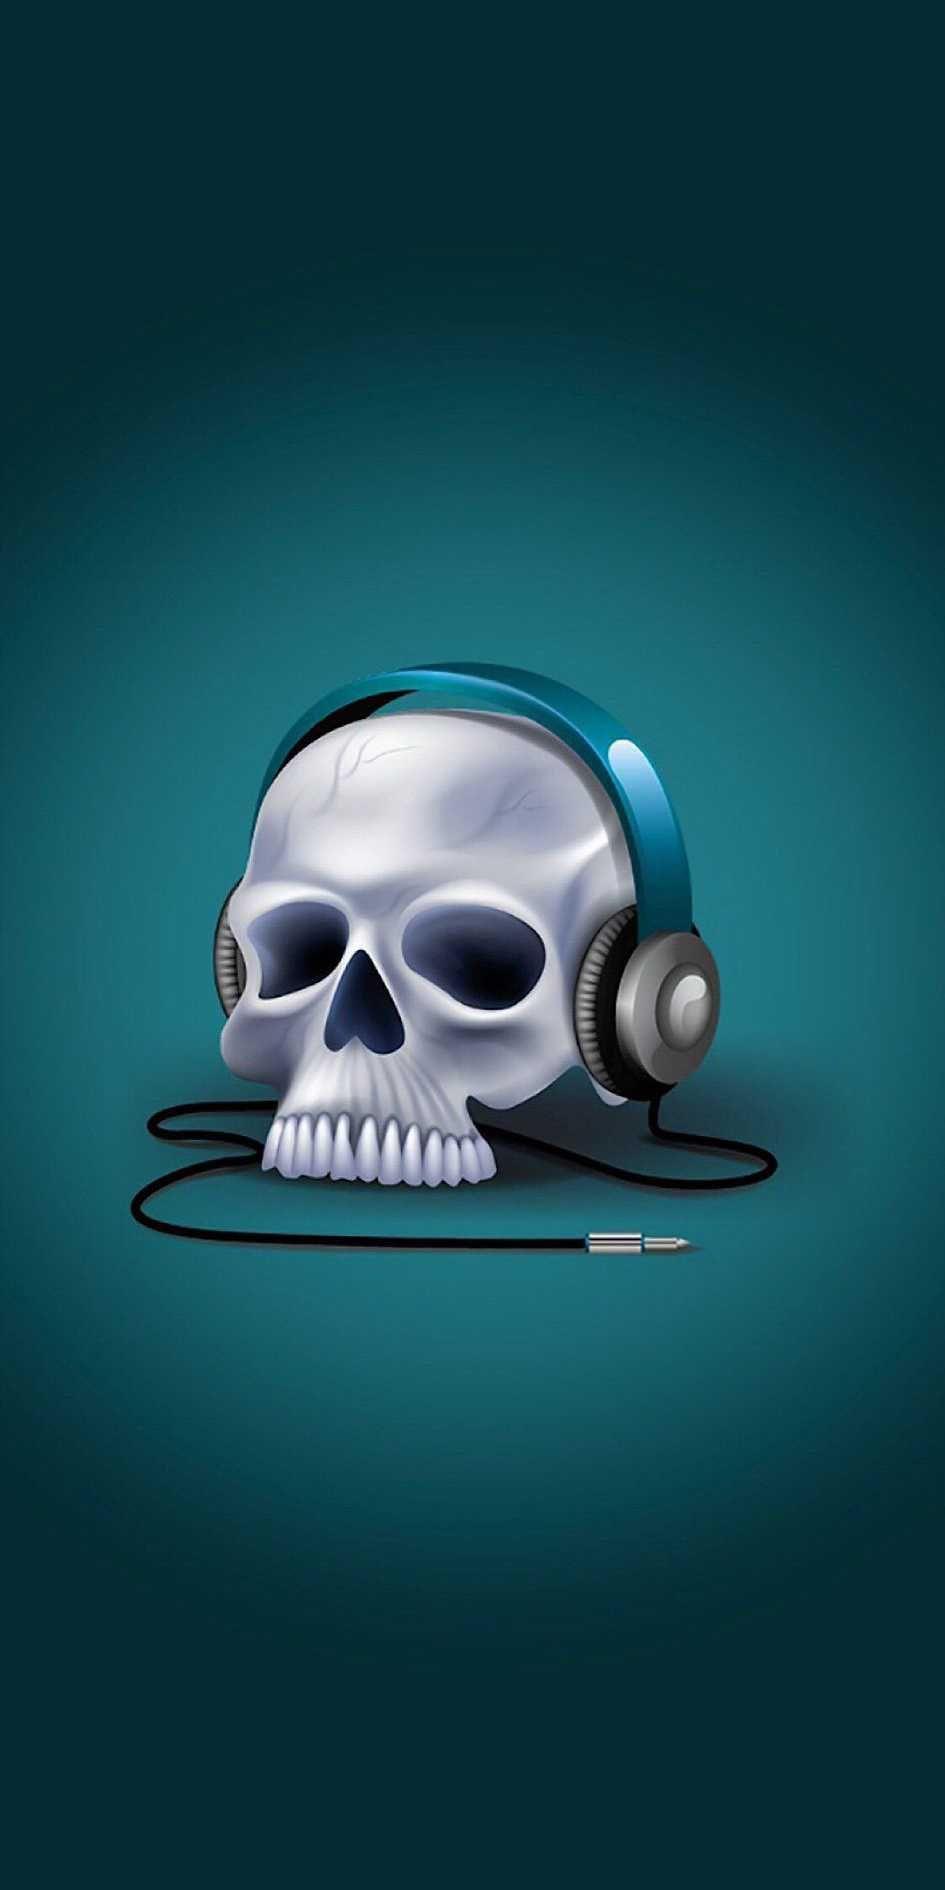 Music Skull Iphone Wallpaper Papel De Parede Engracado Iphone